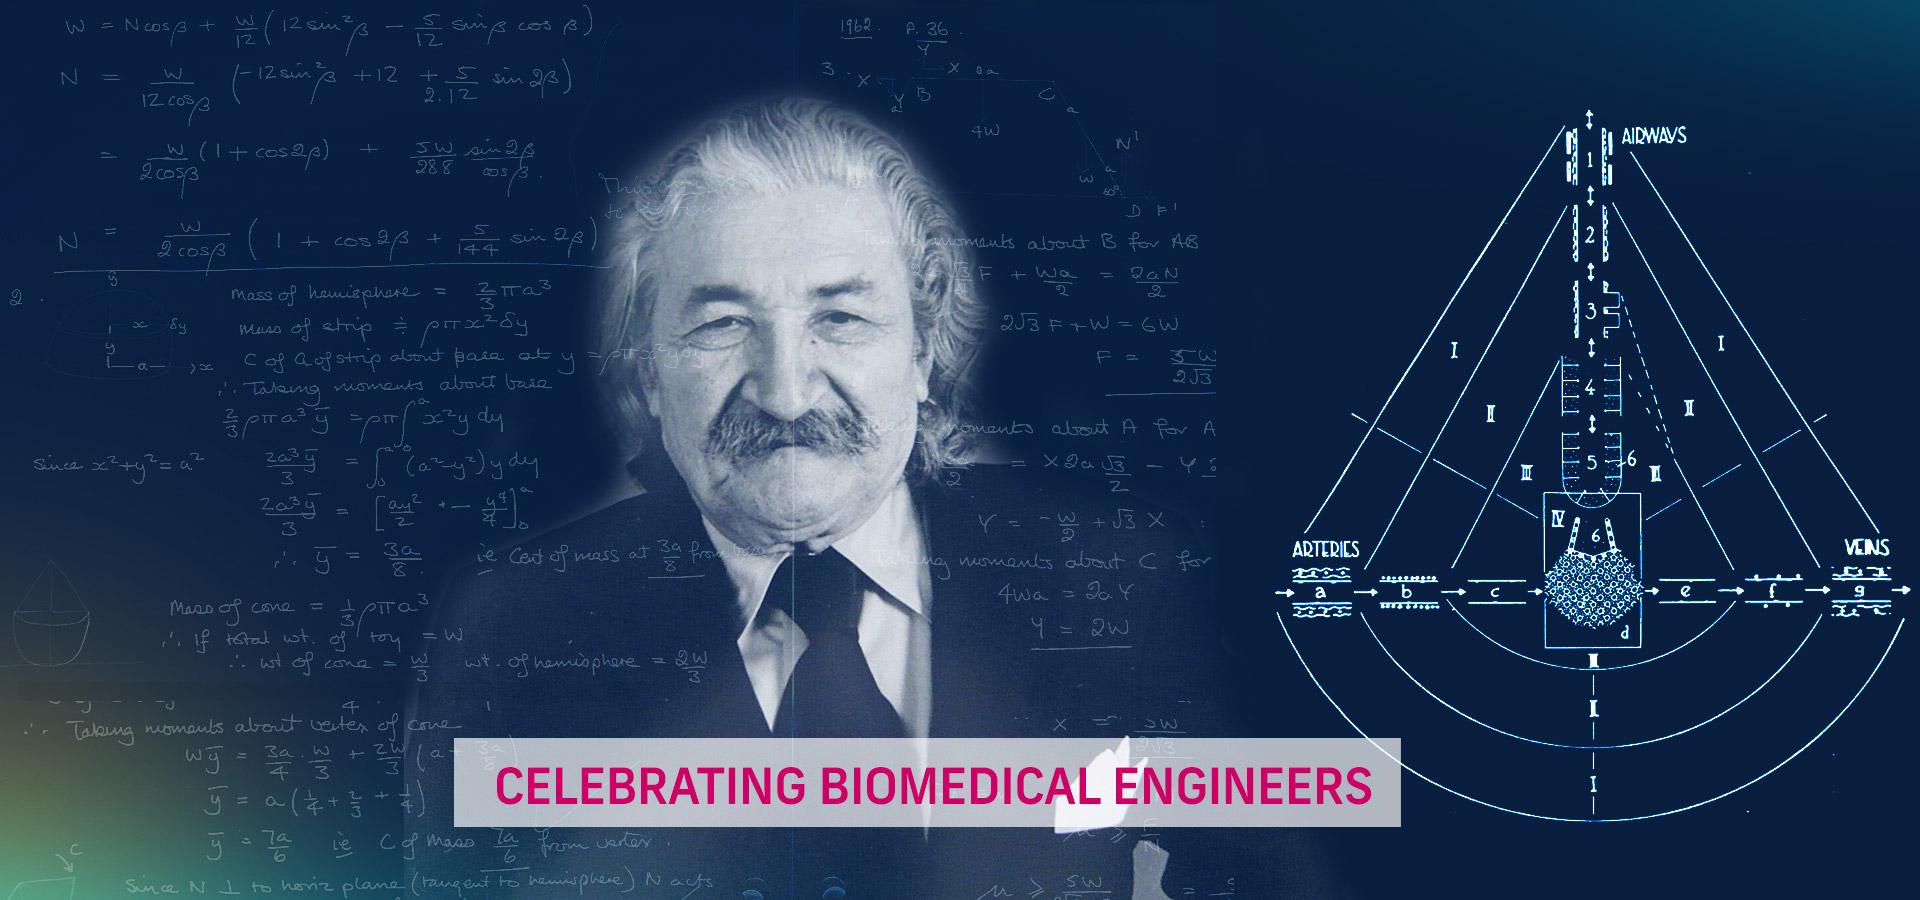 Celebrating Biomedical Engineers